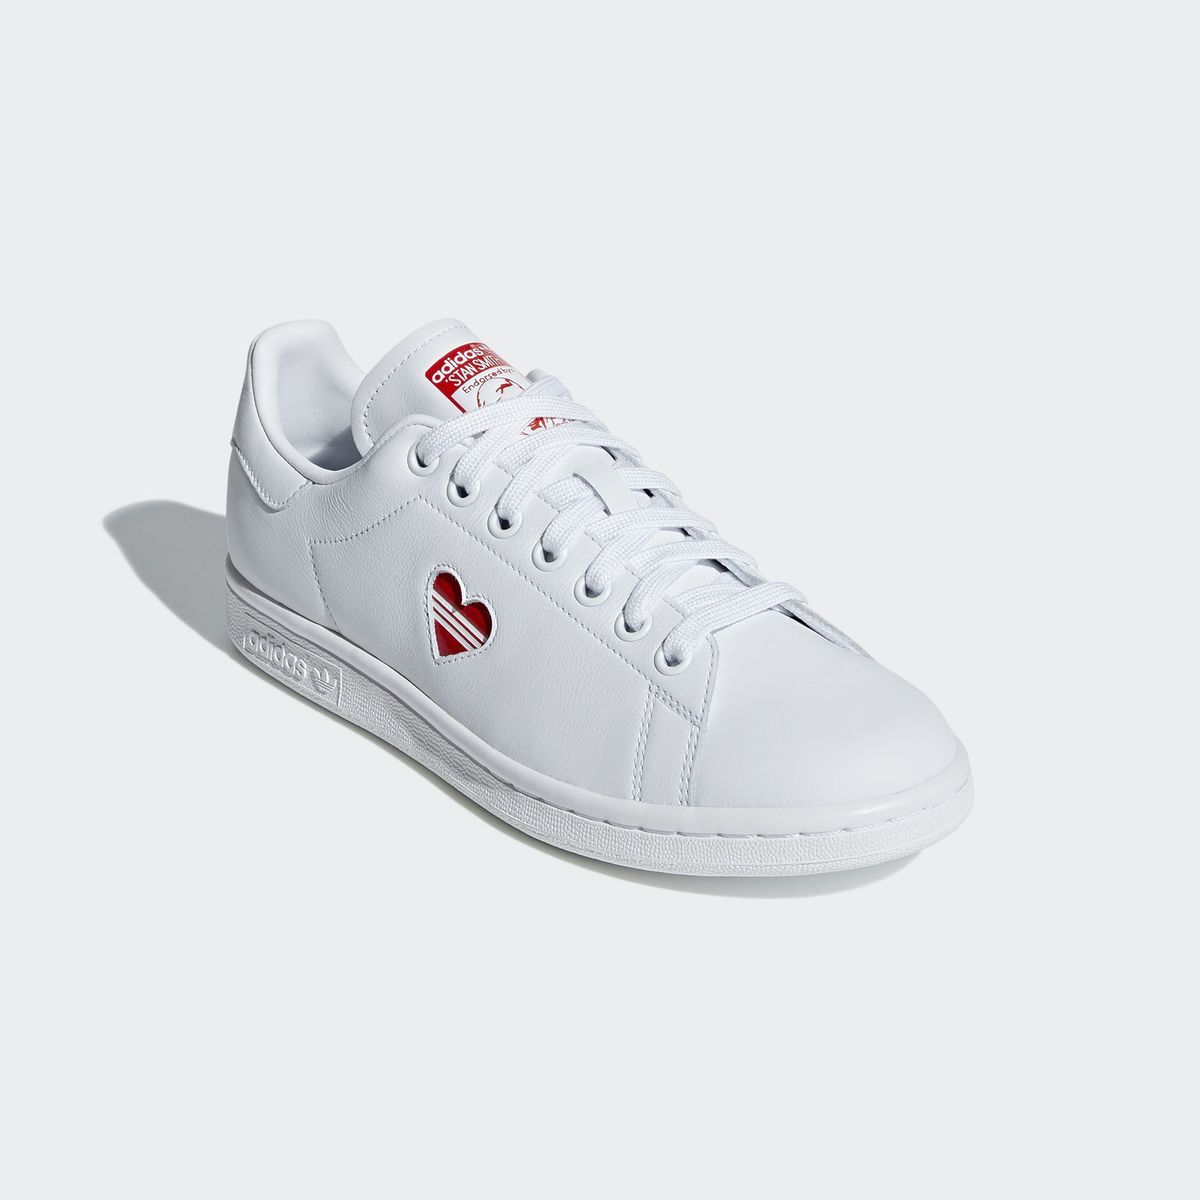 adidas stan smith taille 43